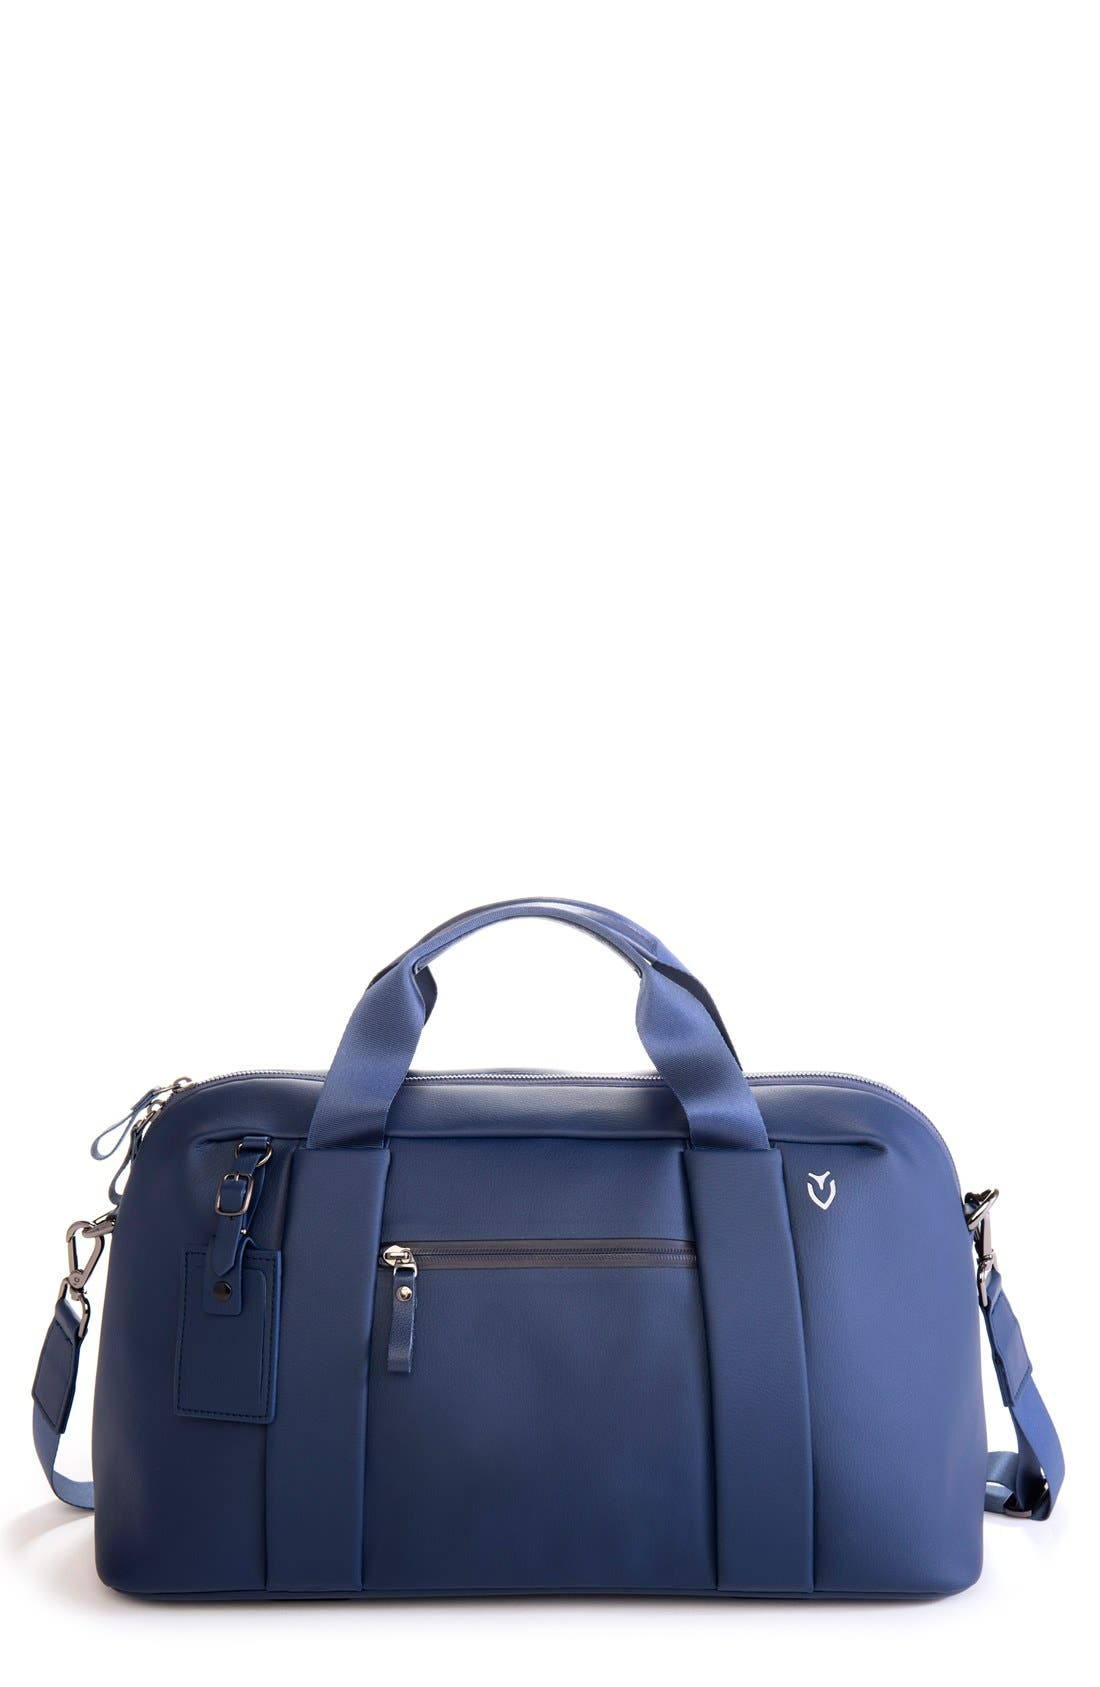 VESSEL 'Signature' Medium Duffel Bag, Main, color, 400